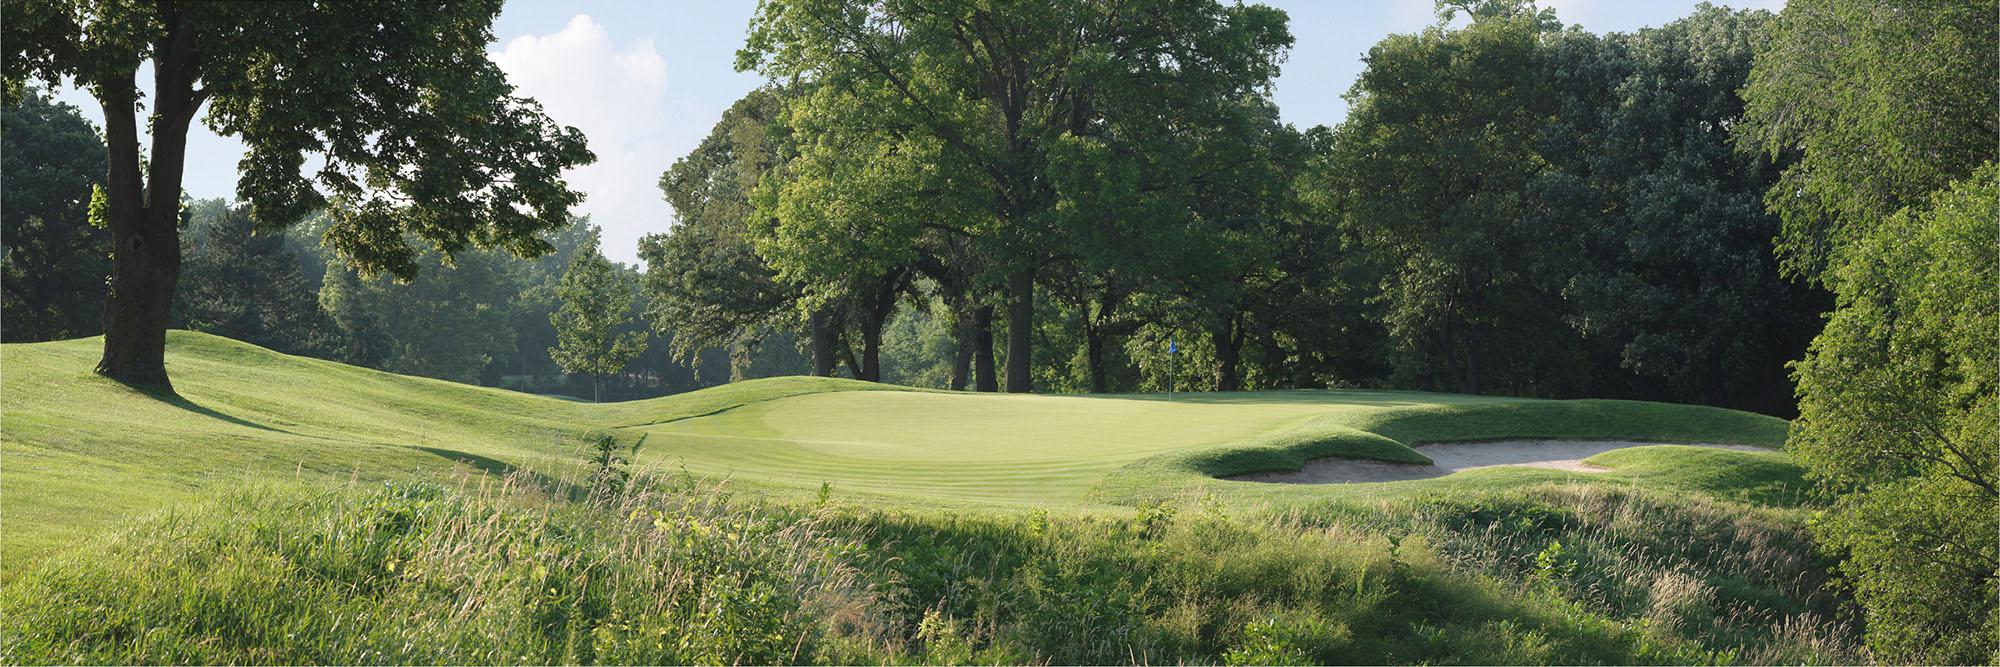 Golf Course Image - Happy Hollow Golf Club No. 3